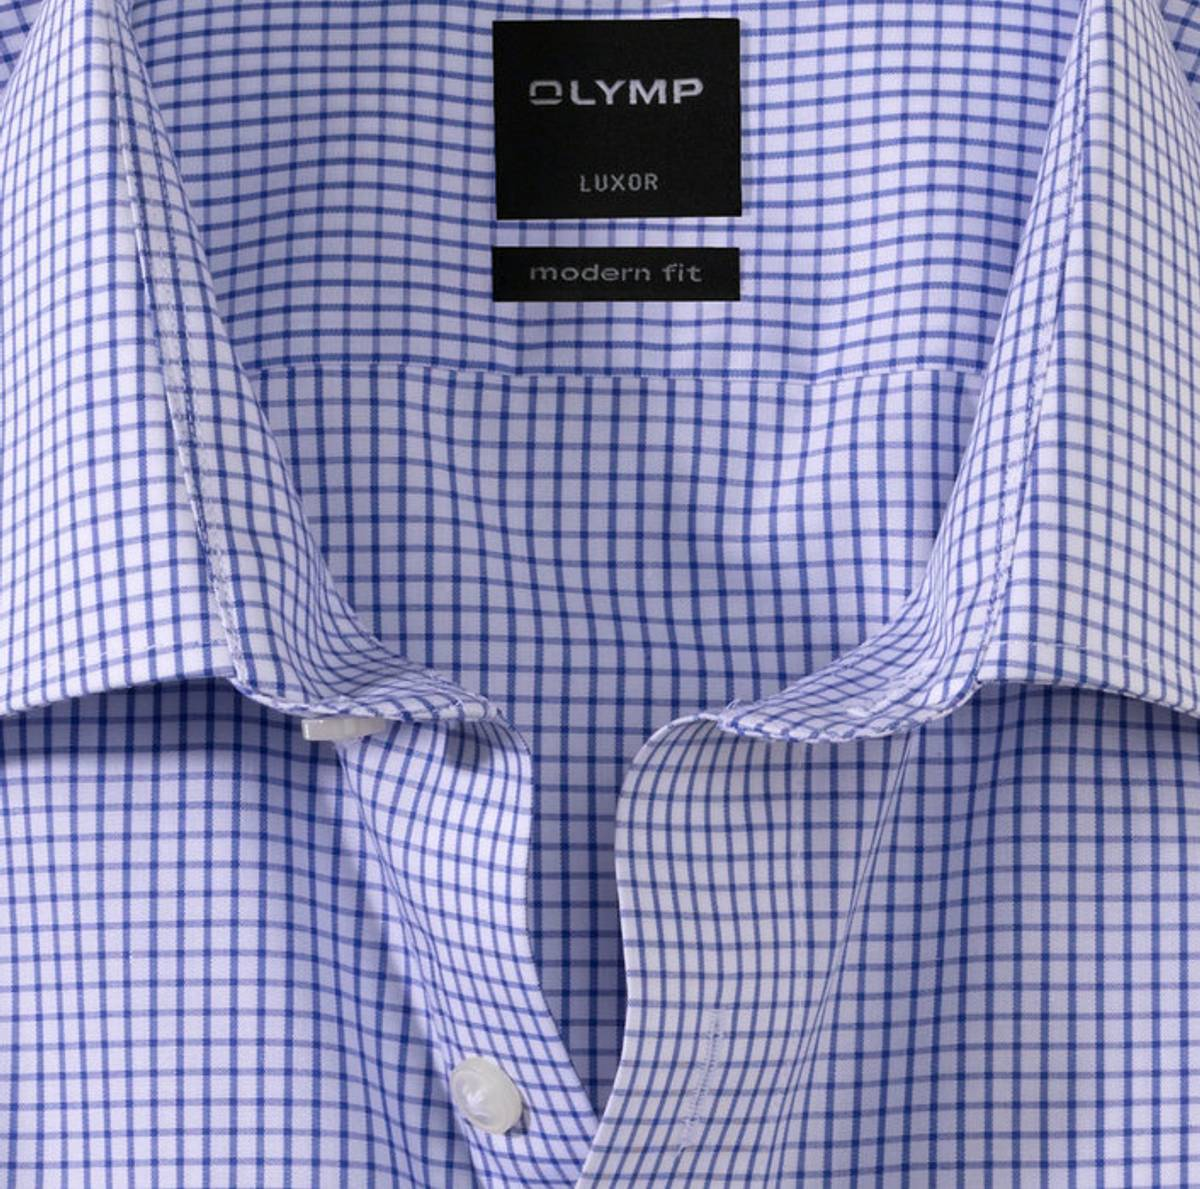 Olymp skjorte blå ruter - Modern fit